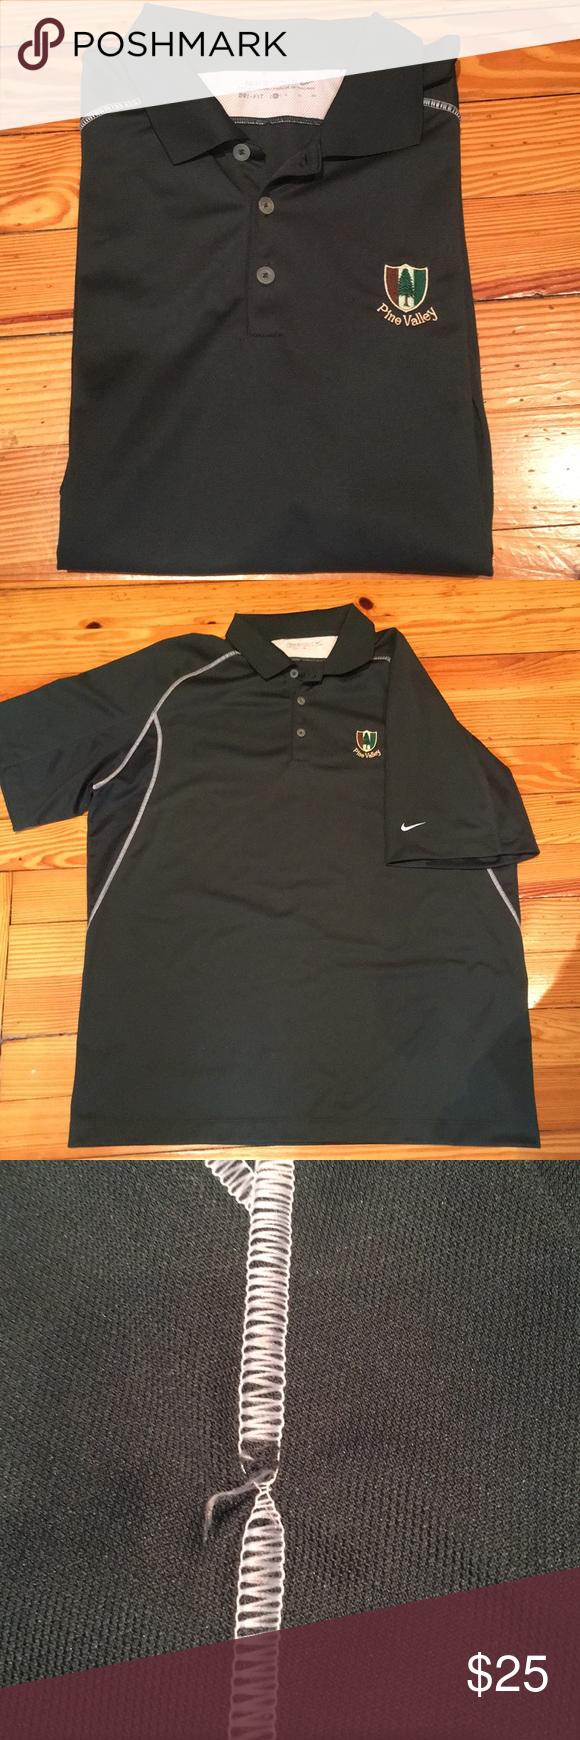 Men's Nike XL Pine Valley Golf Shirt   Golf shirts, Nike ...